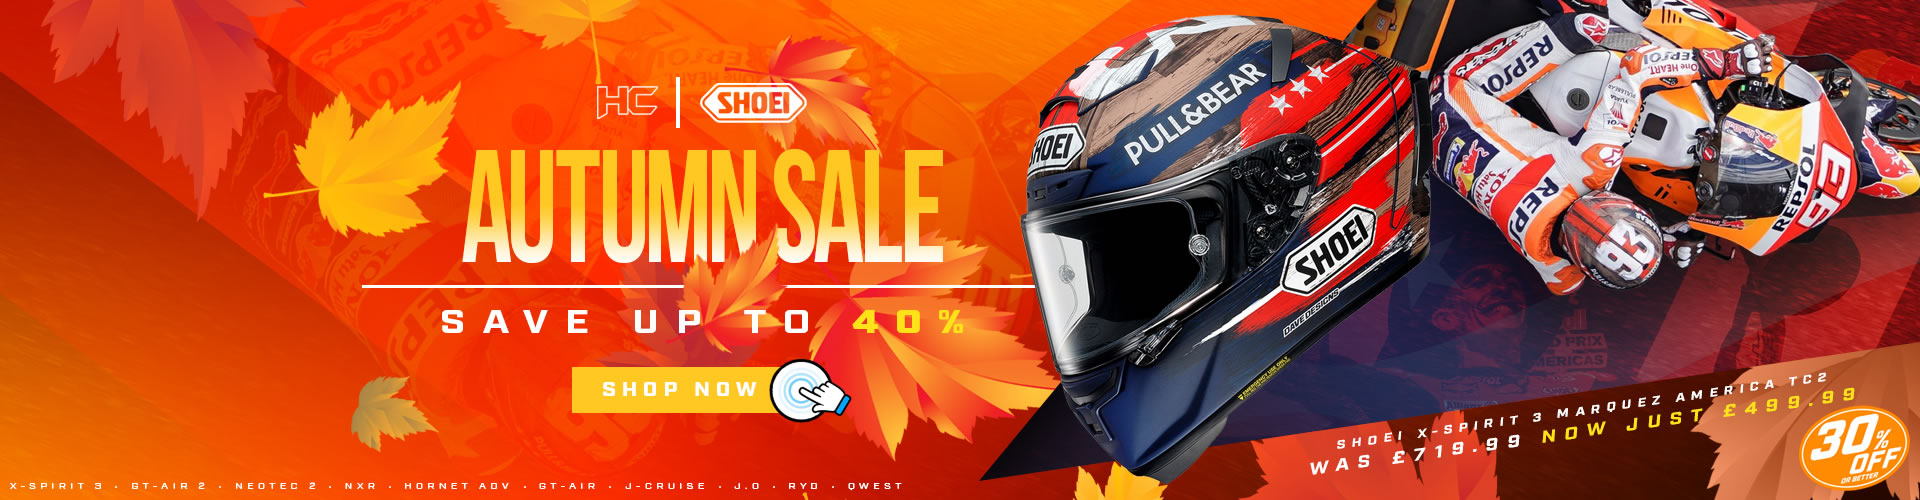 Shoei Autumn Sale at Helmet City